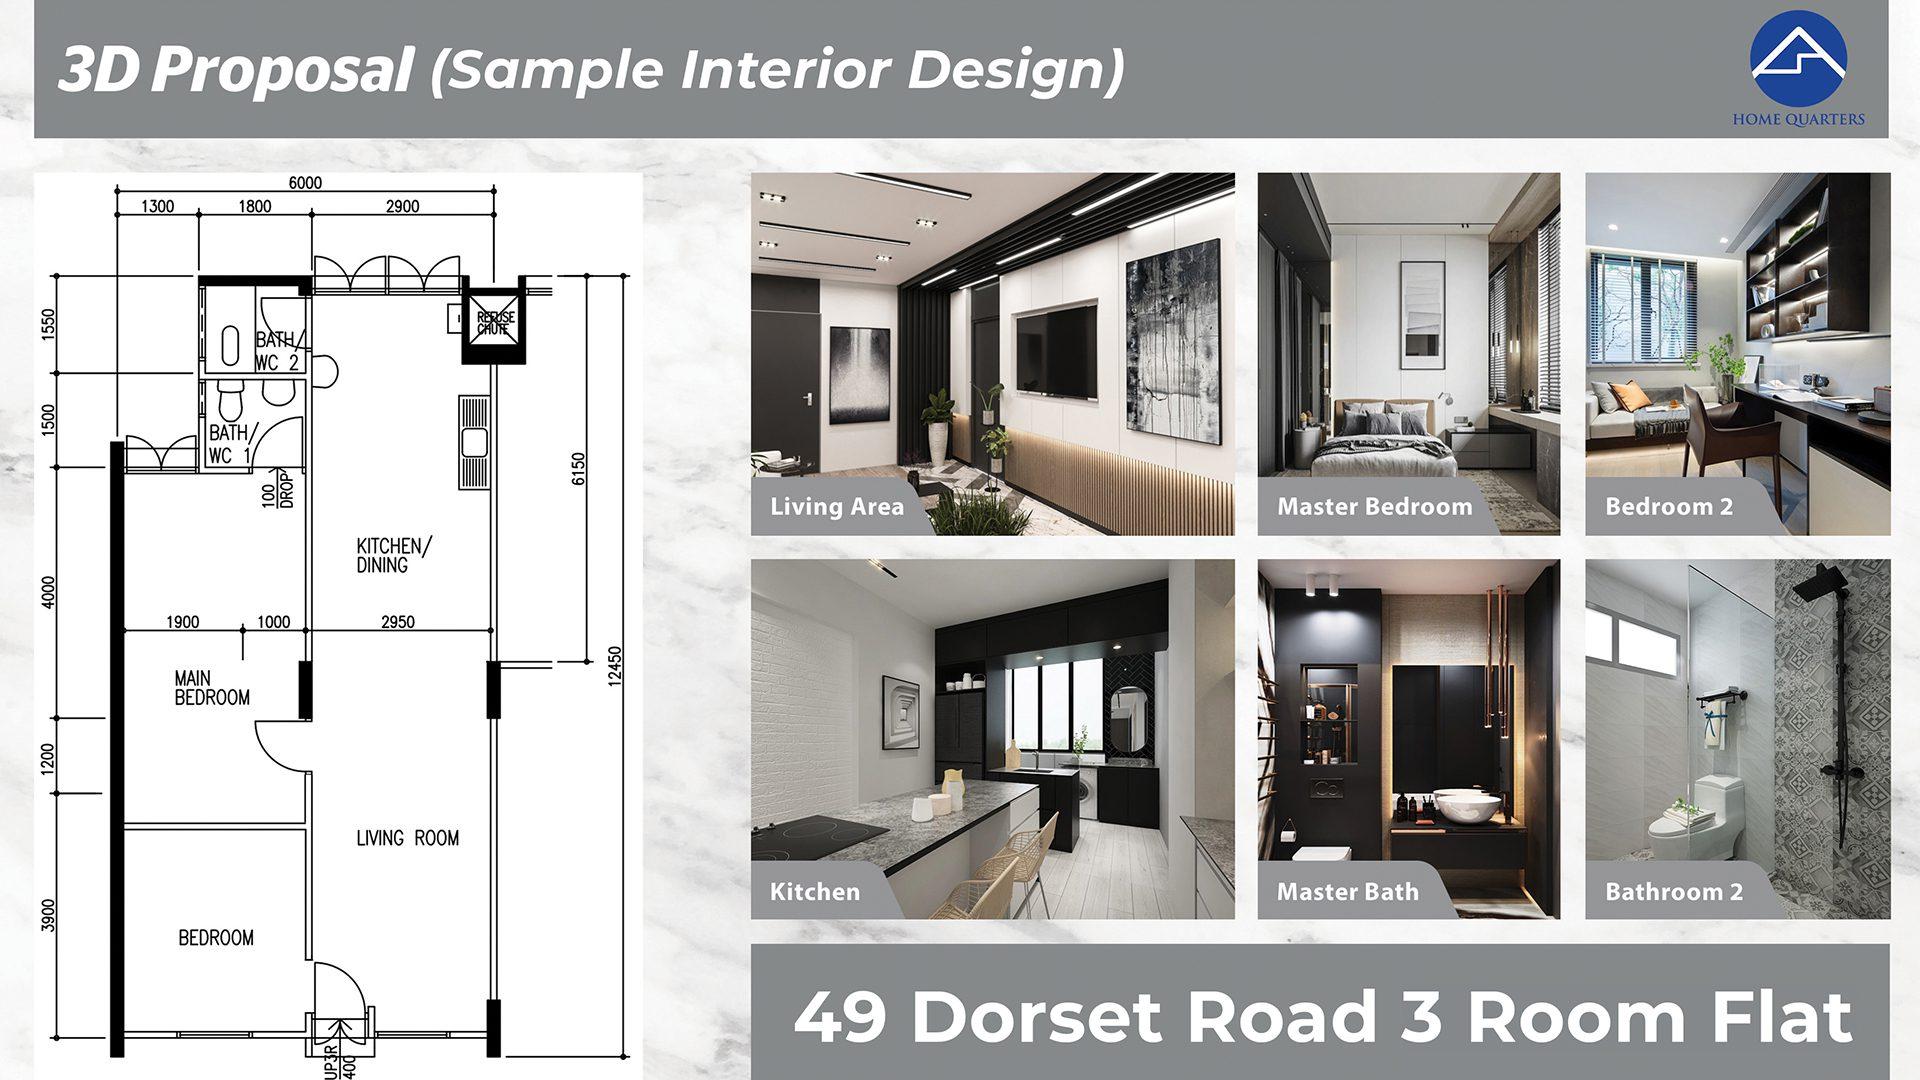 3D Proposal_49 Dorset Road_1920x1080_Home Quarters SG_KC Ng Keng Chong